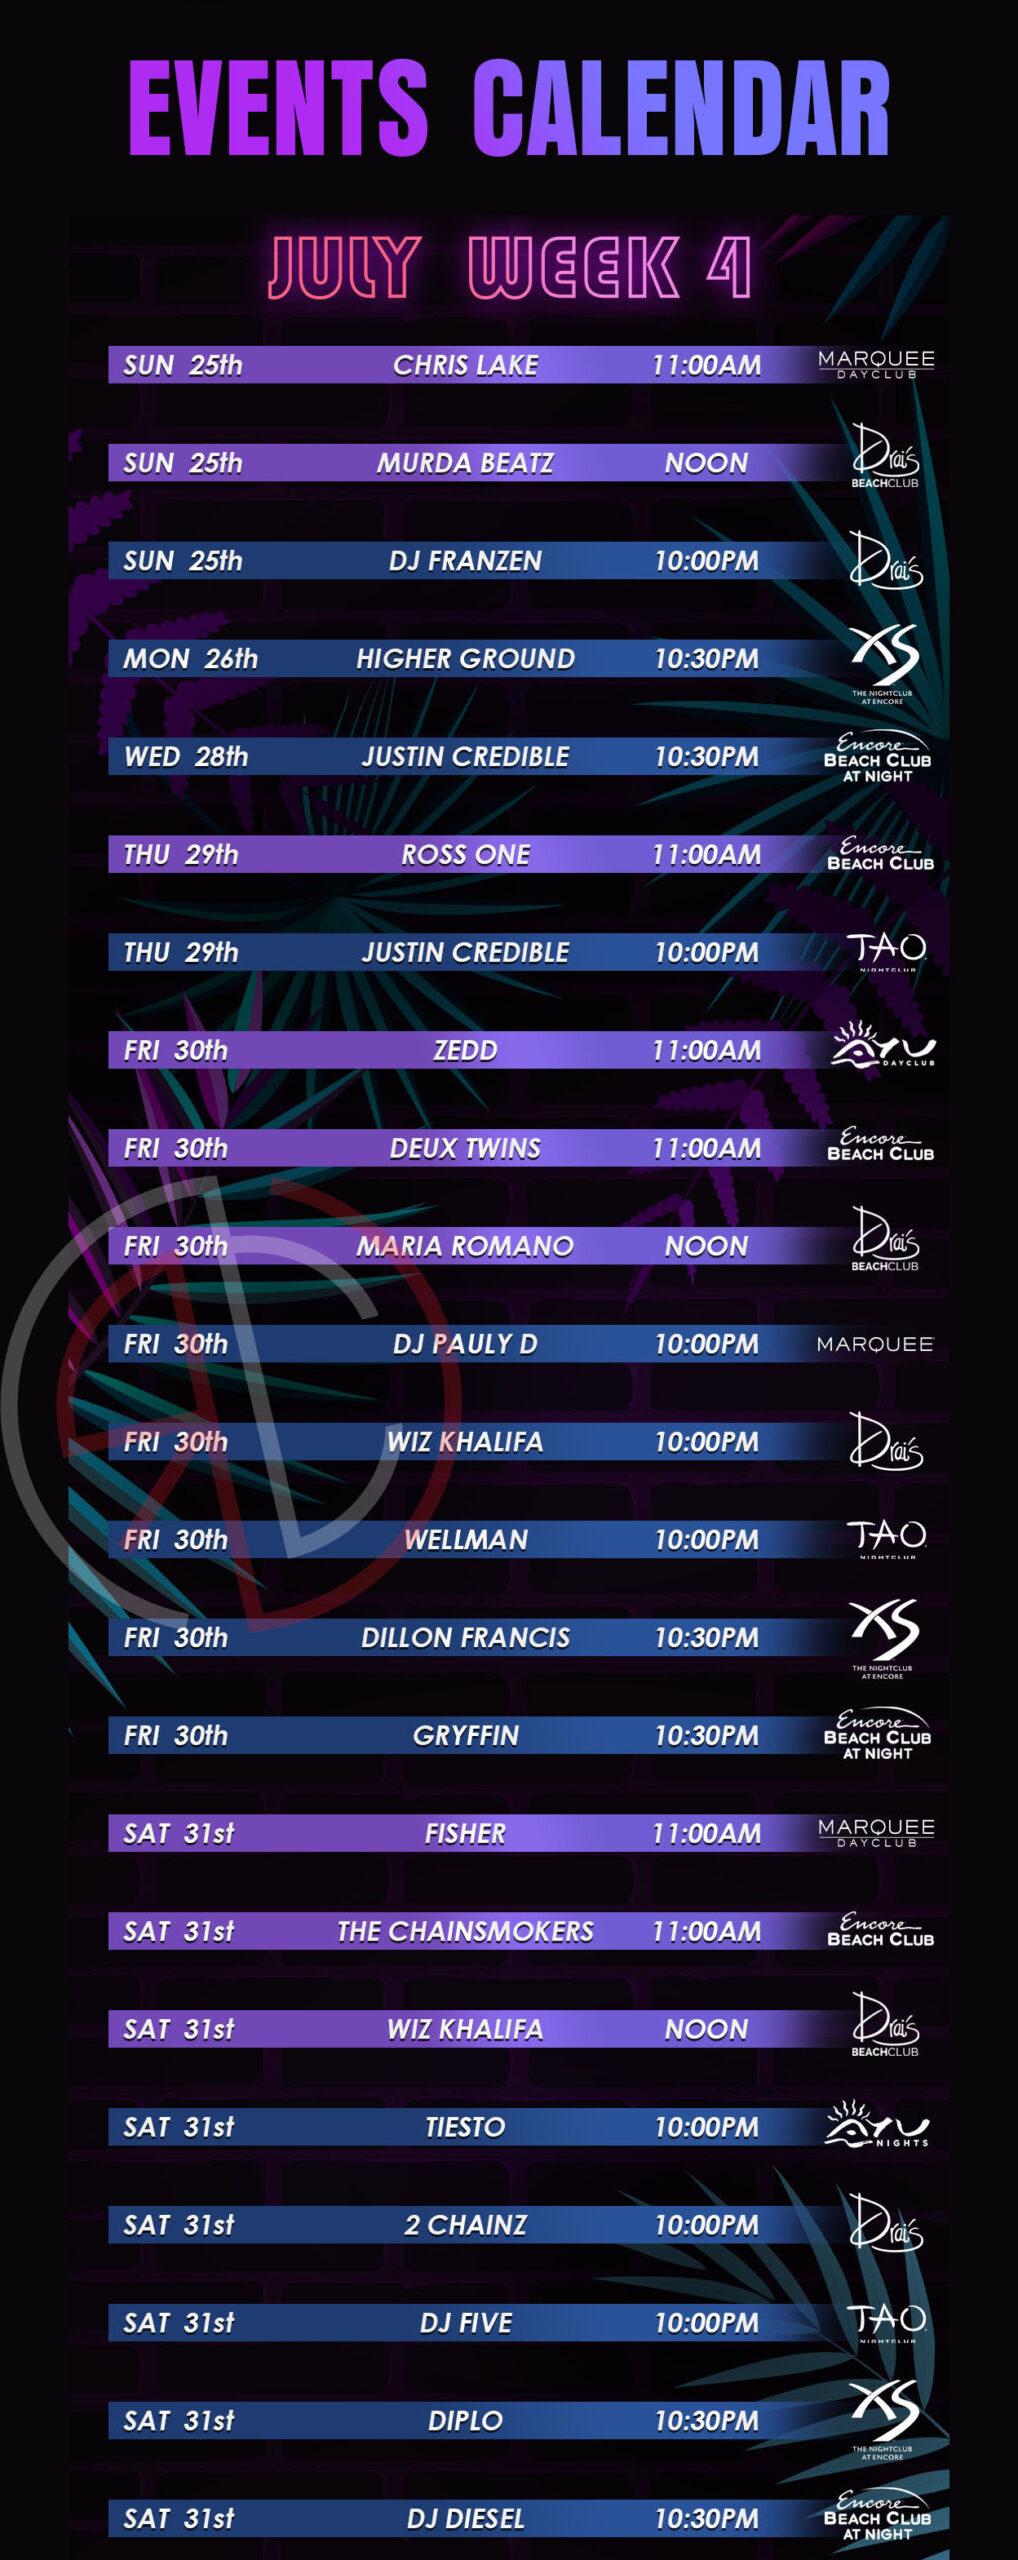 las vegas nightclub and dayclub july 2021 week 4 events calendar